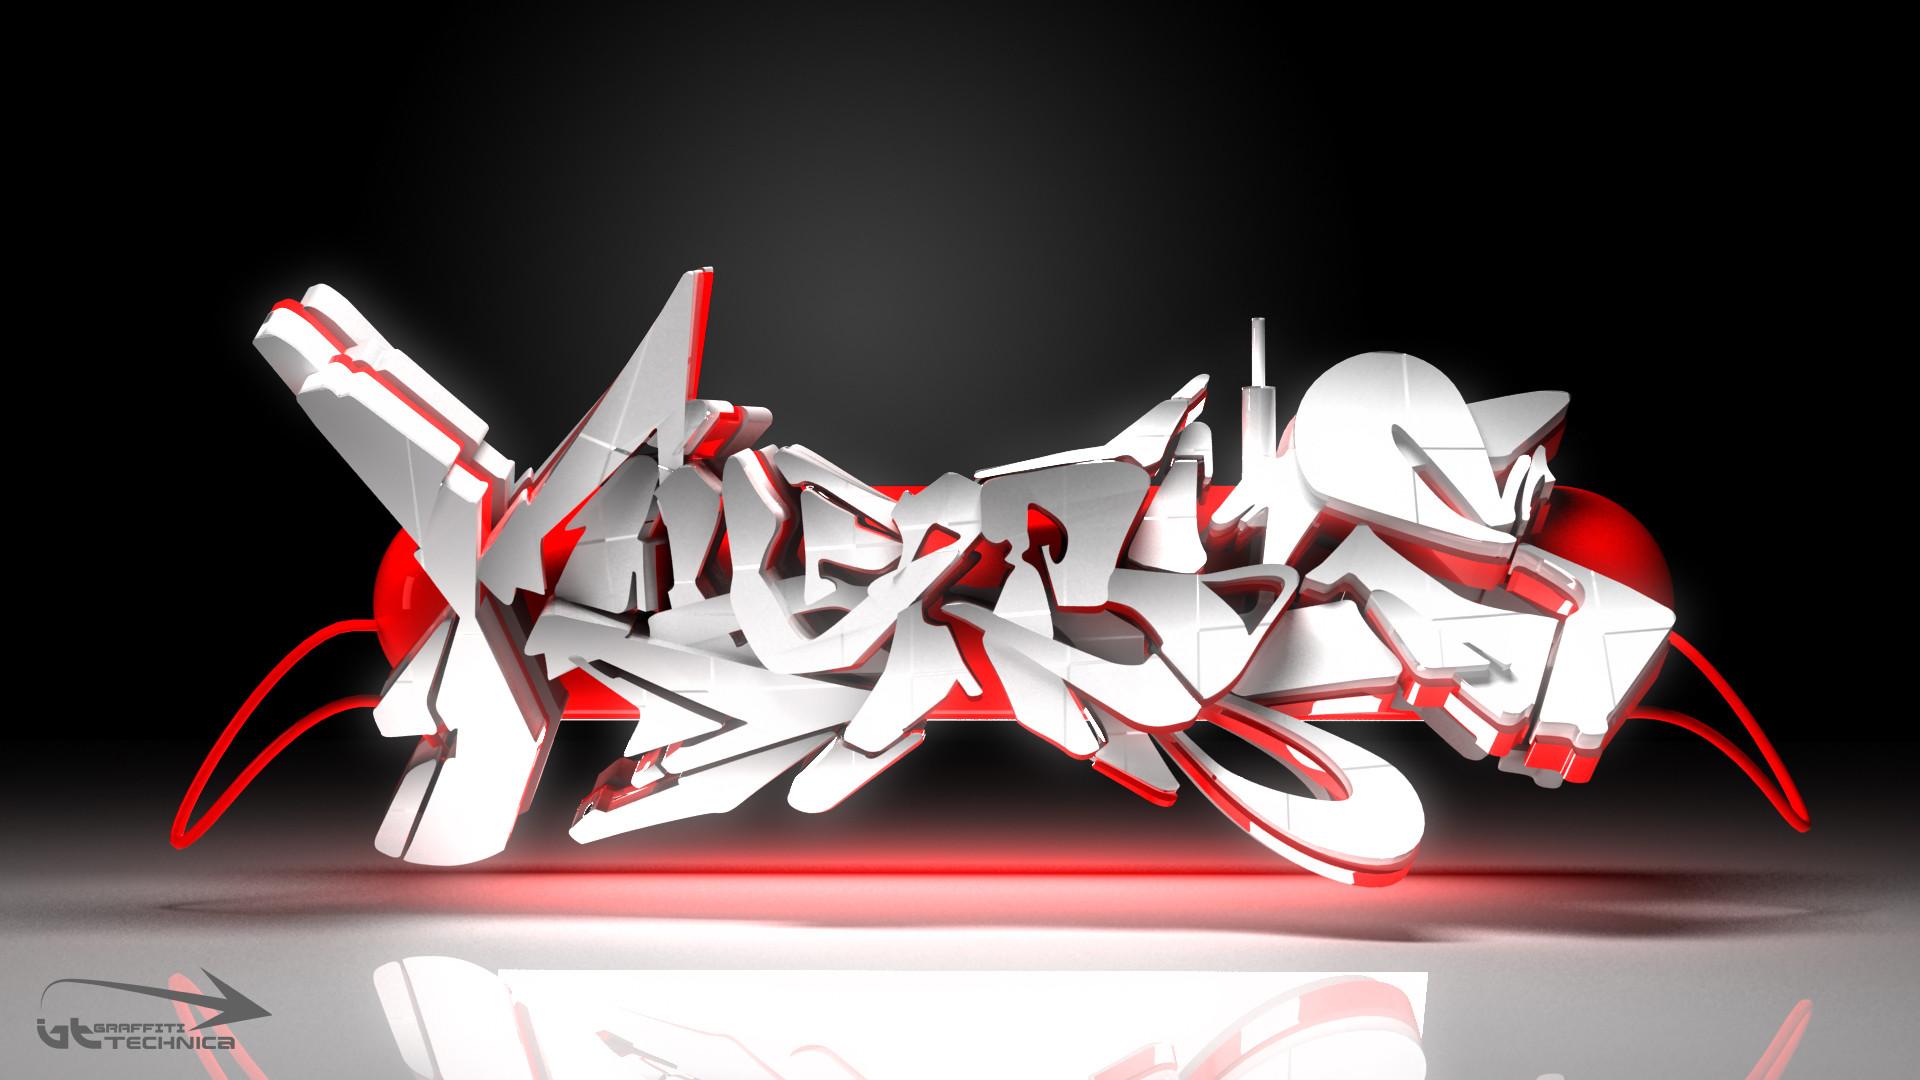 3D Graffiti Wallpapers 76 Images